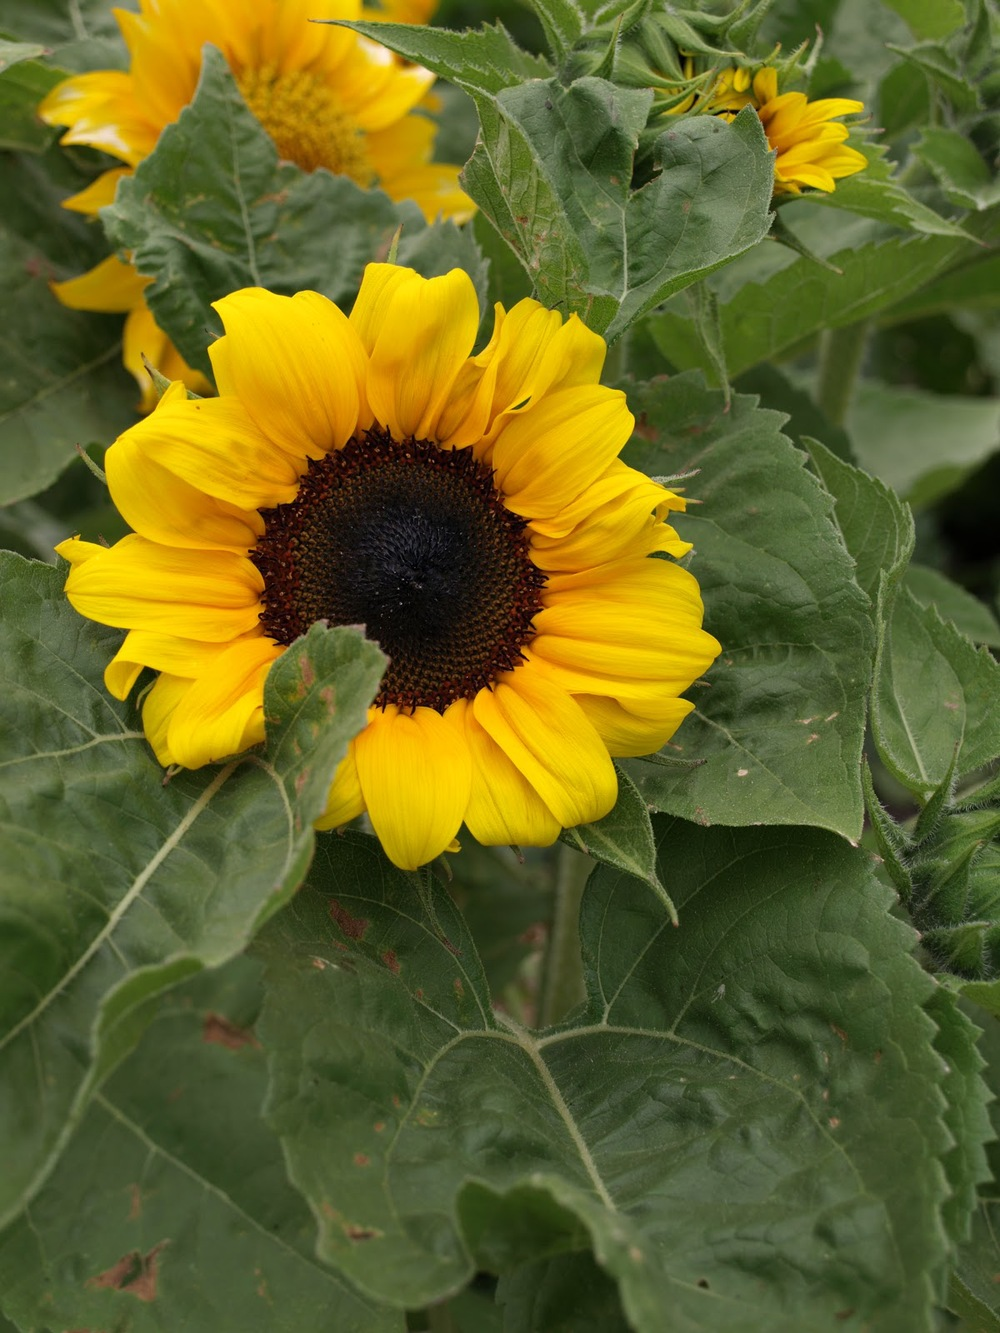 Dwarf Sunsation sunflowers